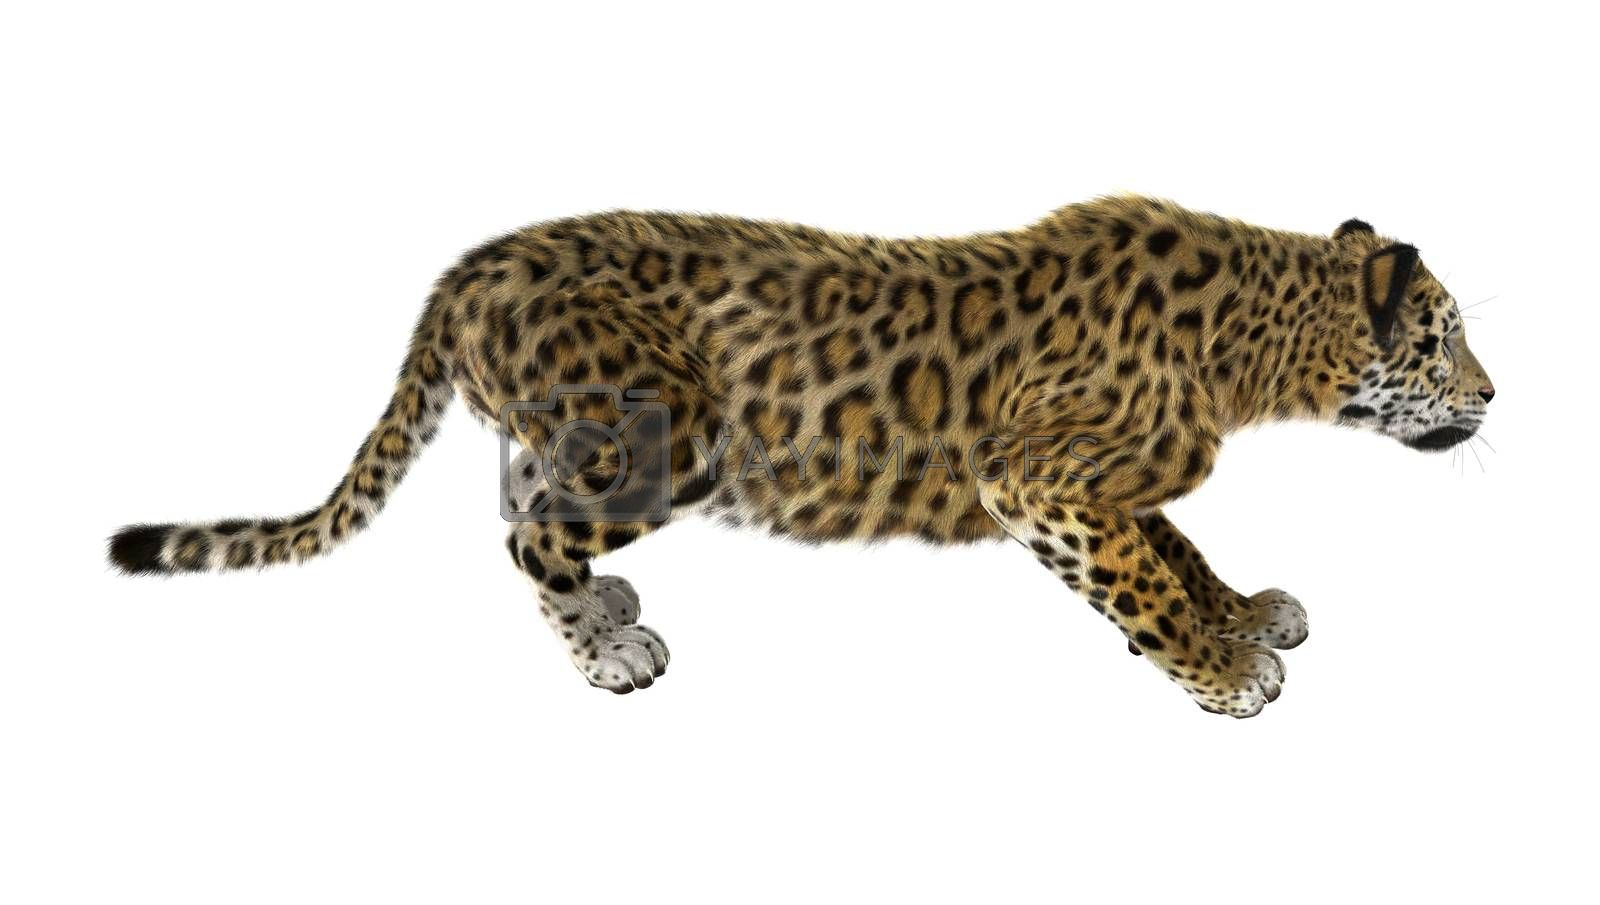 Royalty free image of Big Cat Jaguar by Vac